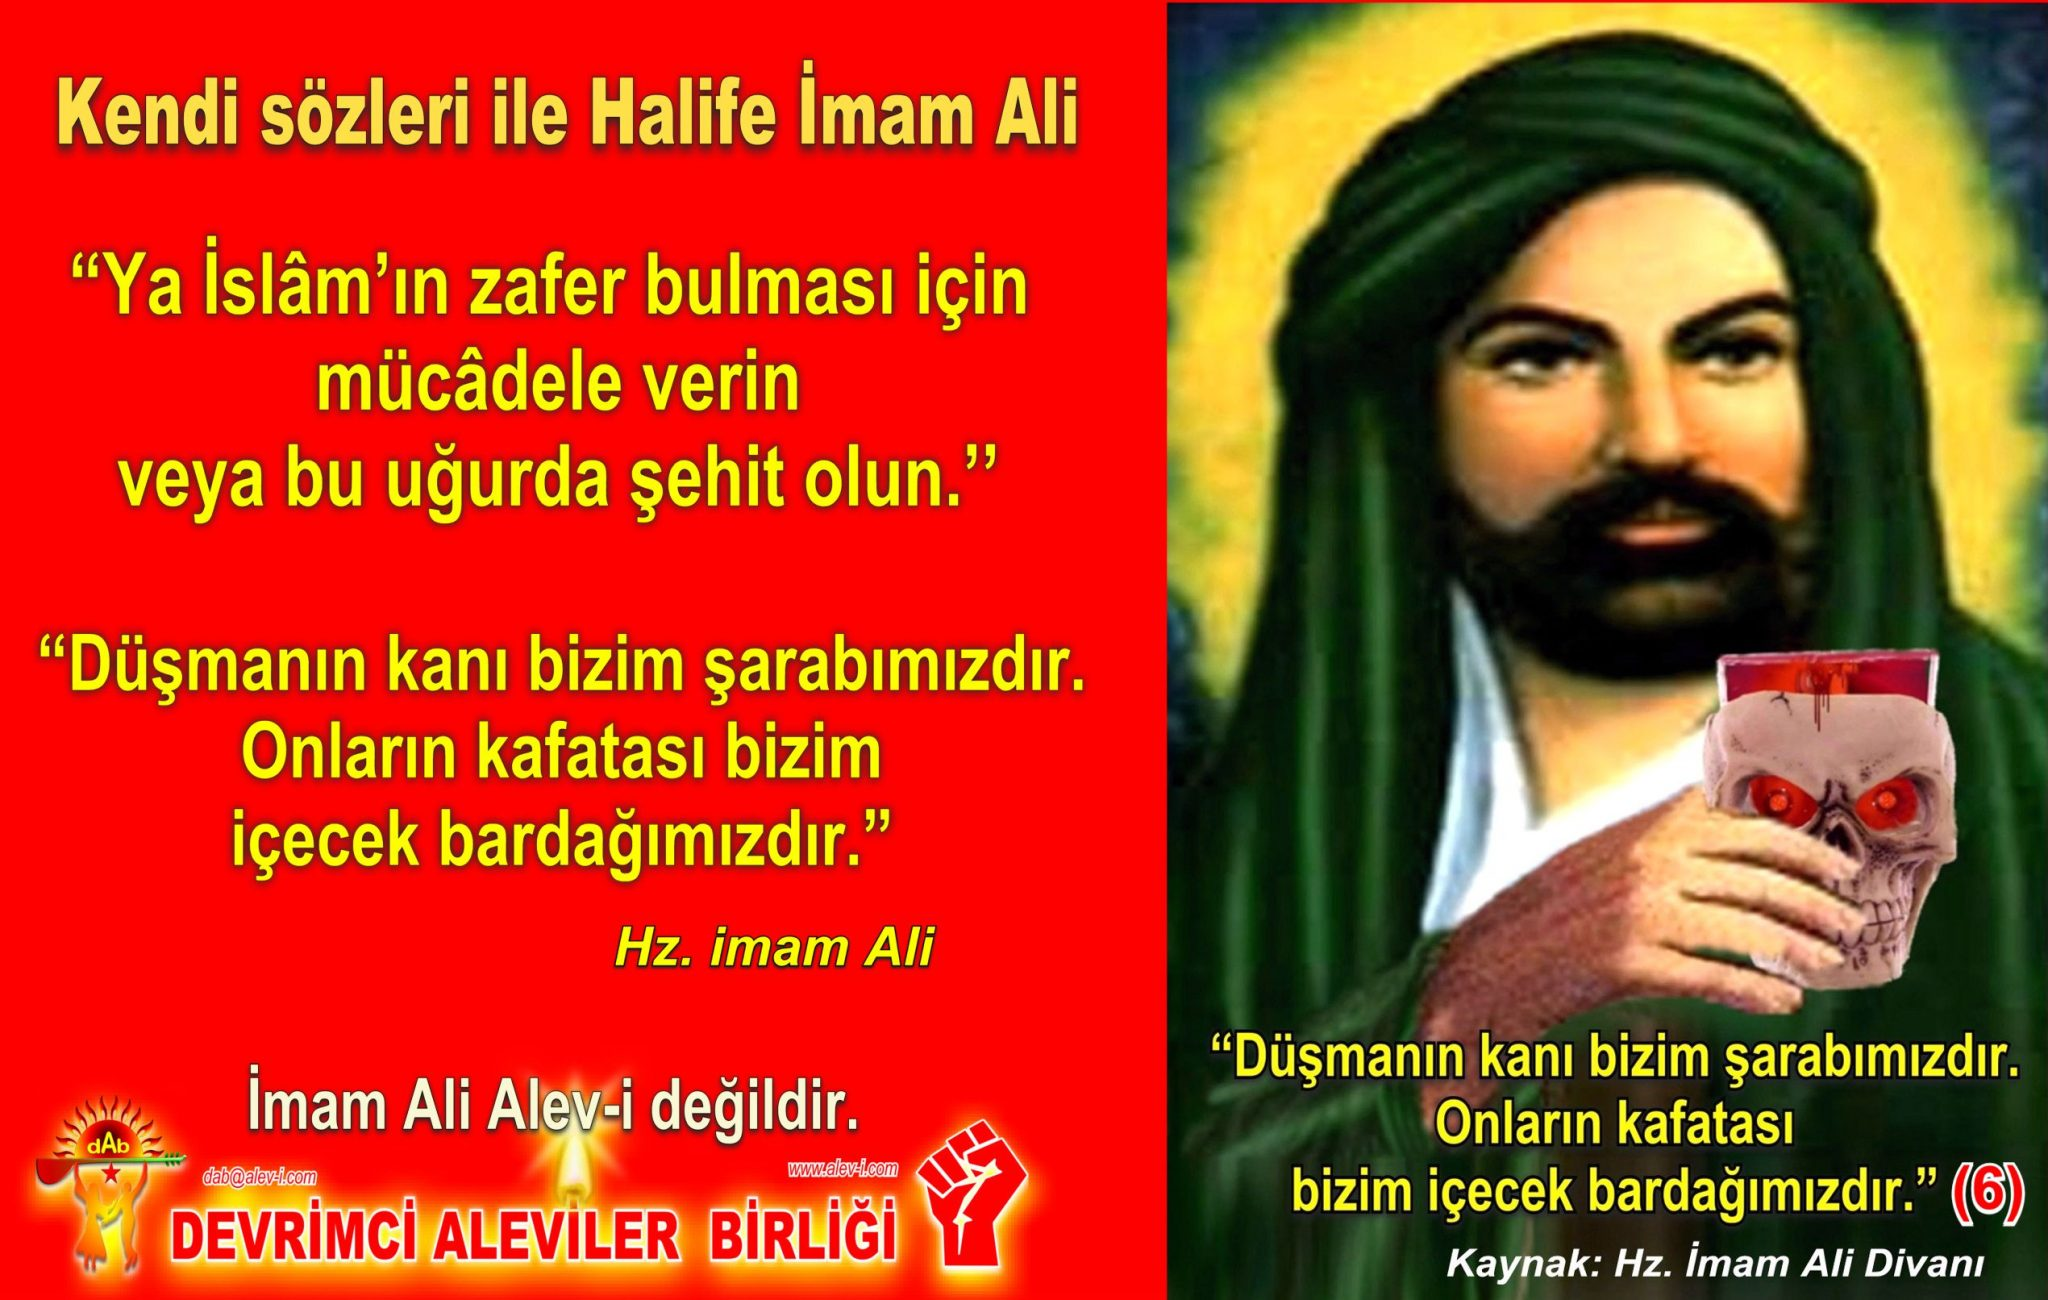 6 Hz imam Ali divani Alevi bektasi kizilbas pir sultan devrimci aleviler birligi DAB Feramuz Sah Acar